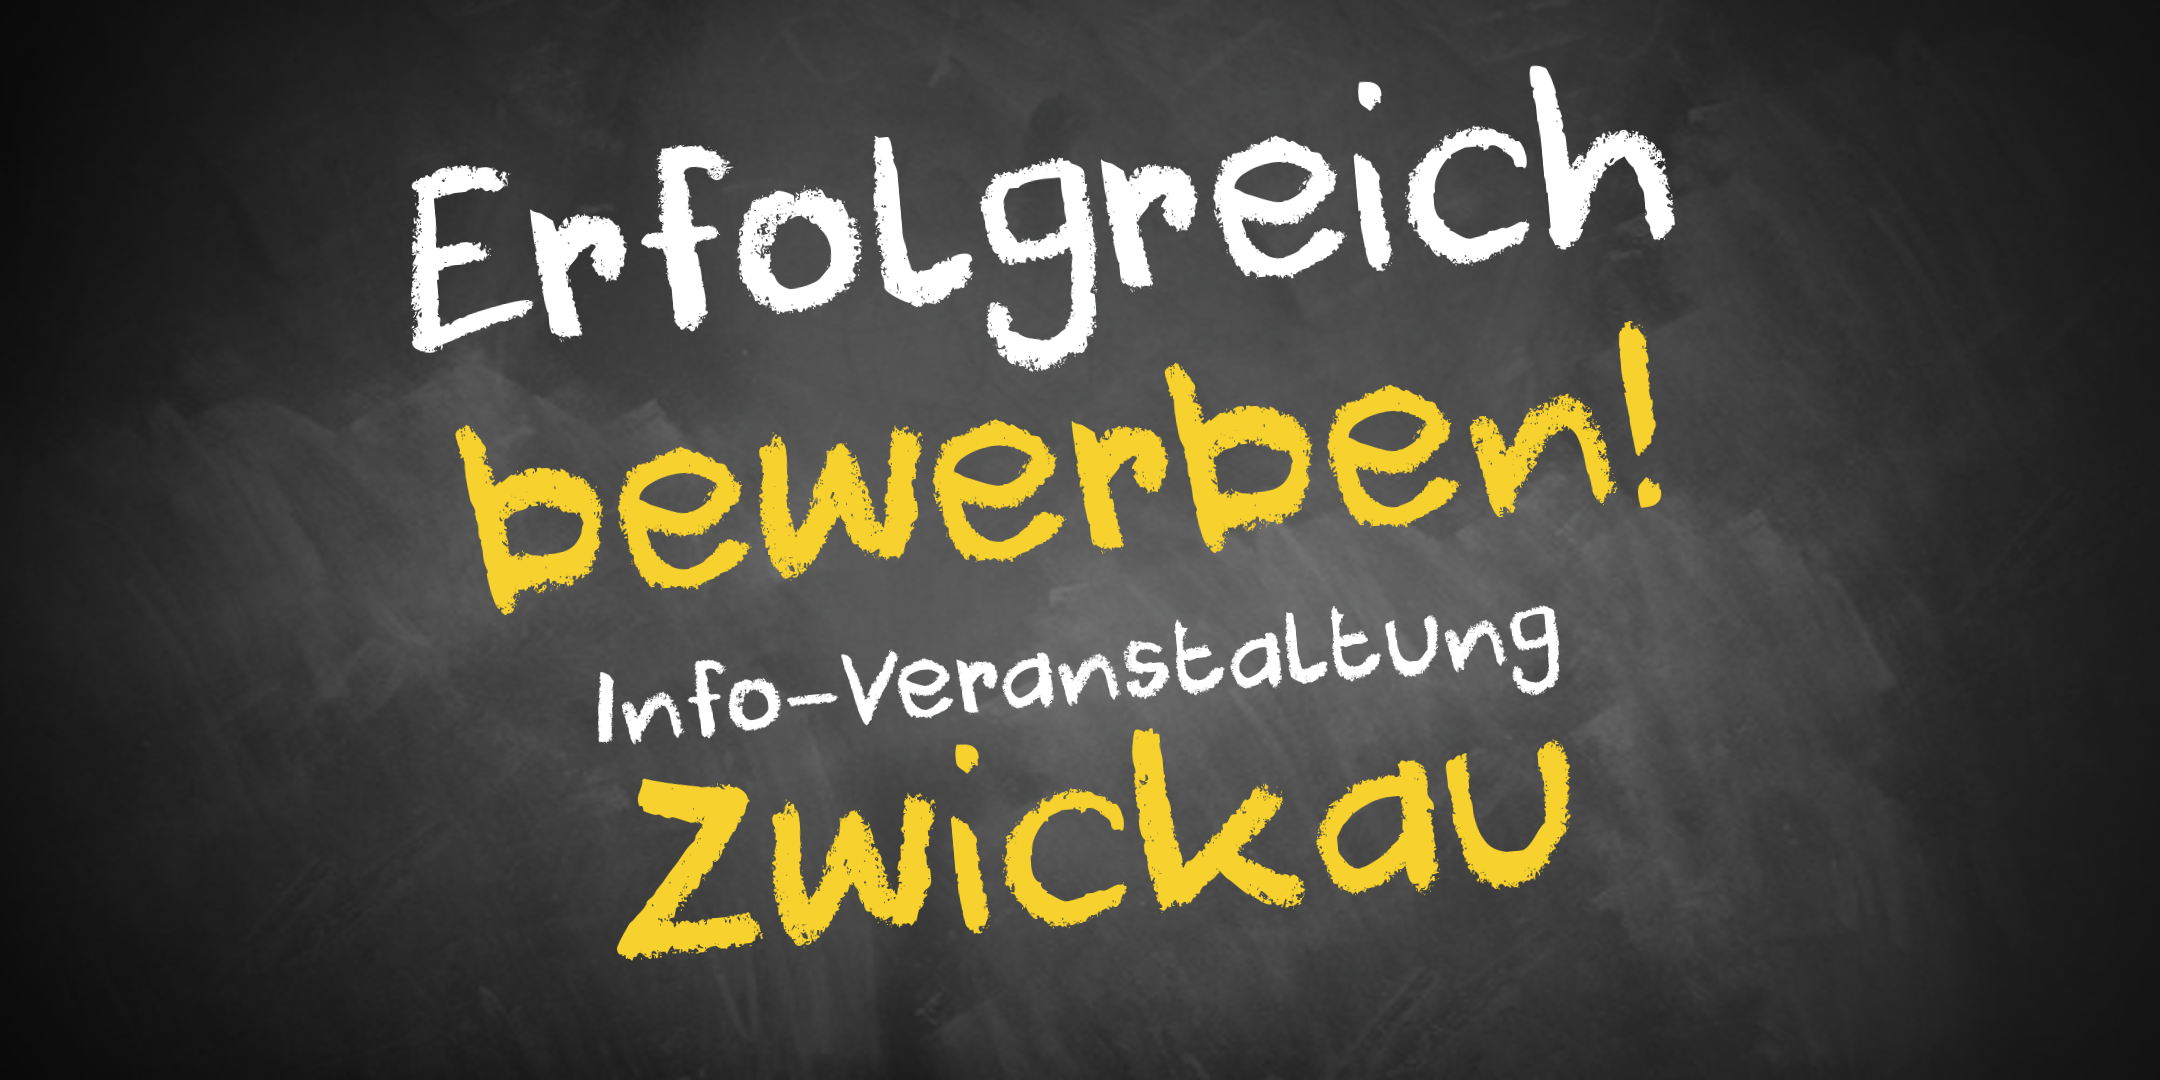 Bewerbungscoaching Infoveranstaltung Zwickau